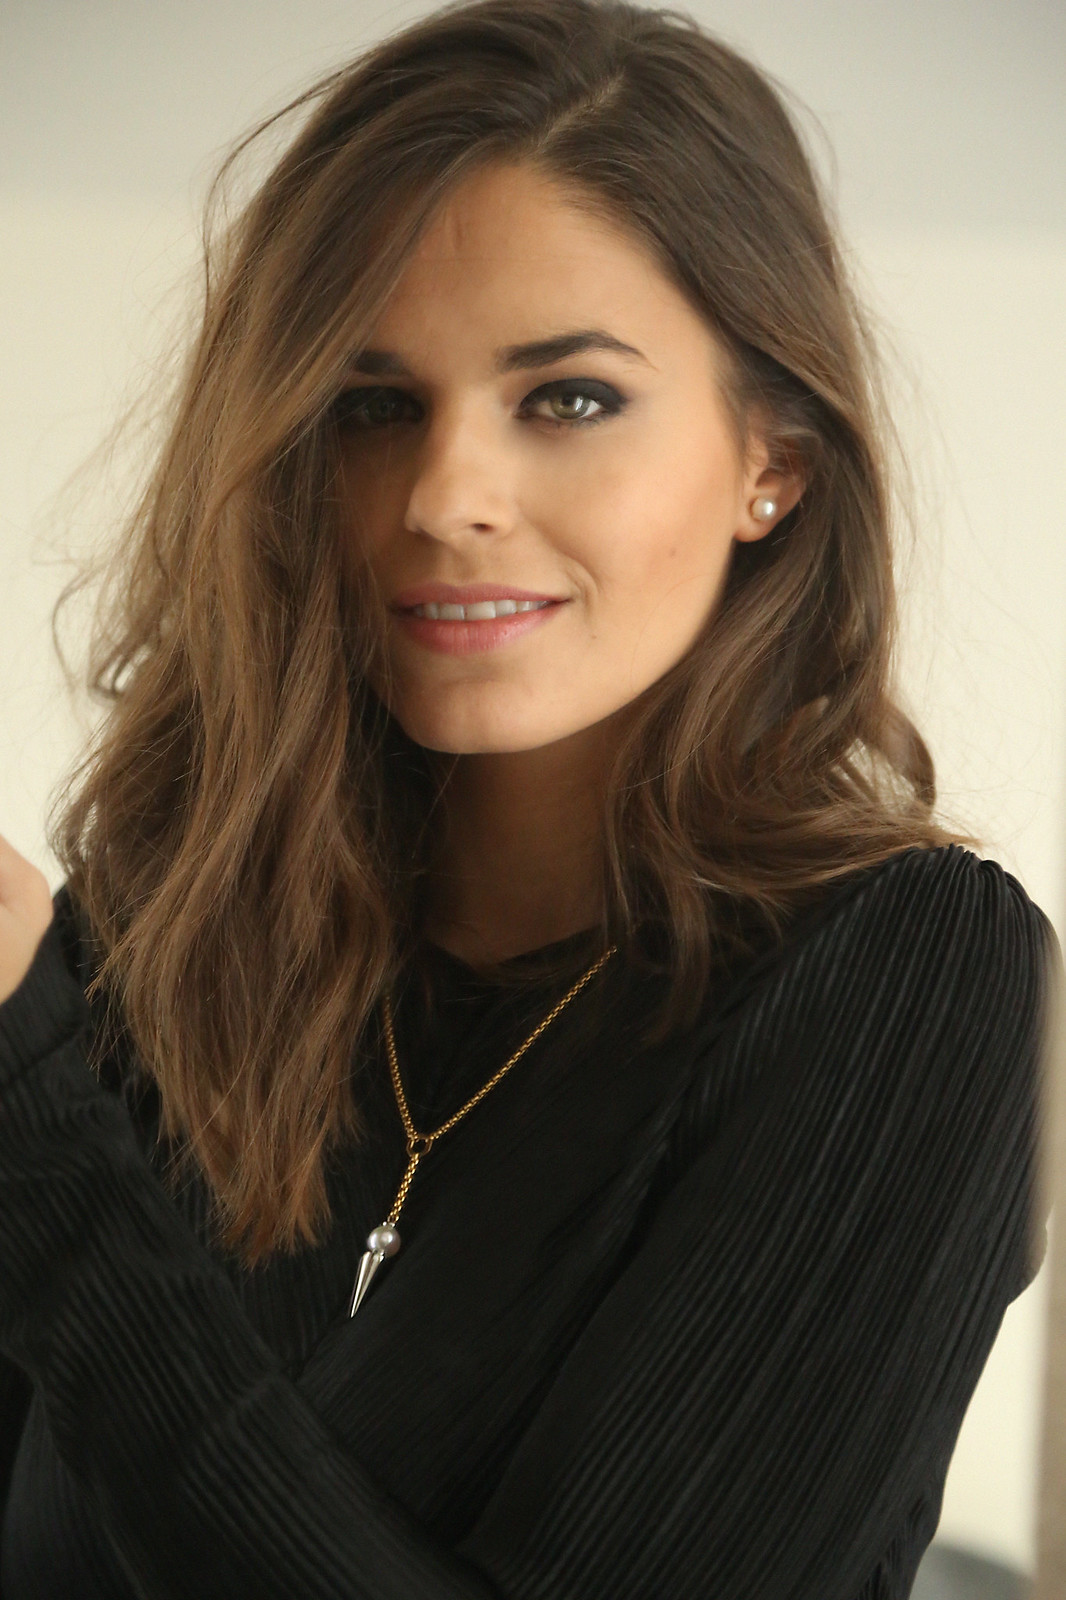 majorica joyas black long dress - jessie chanes 8